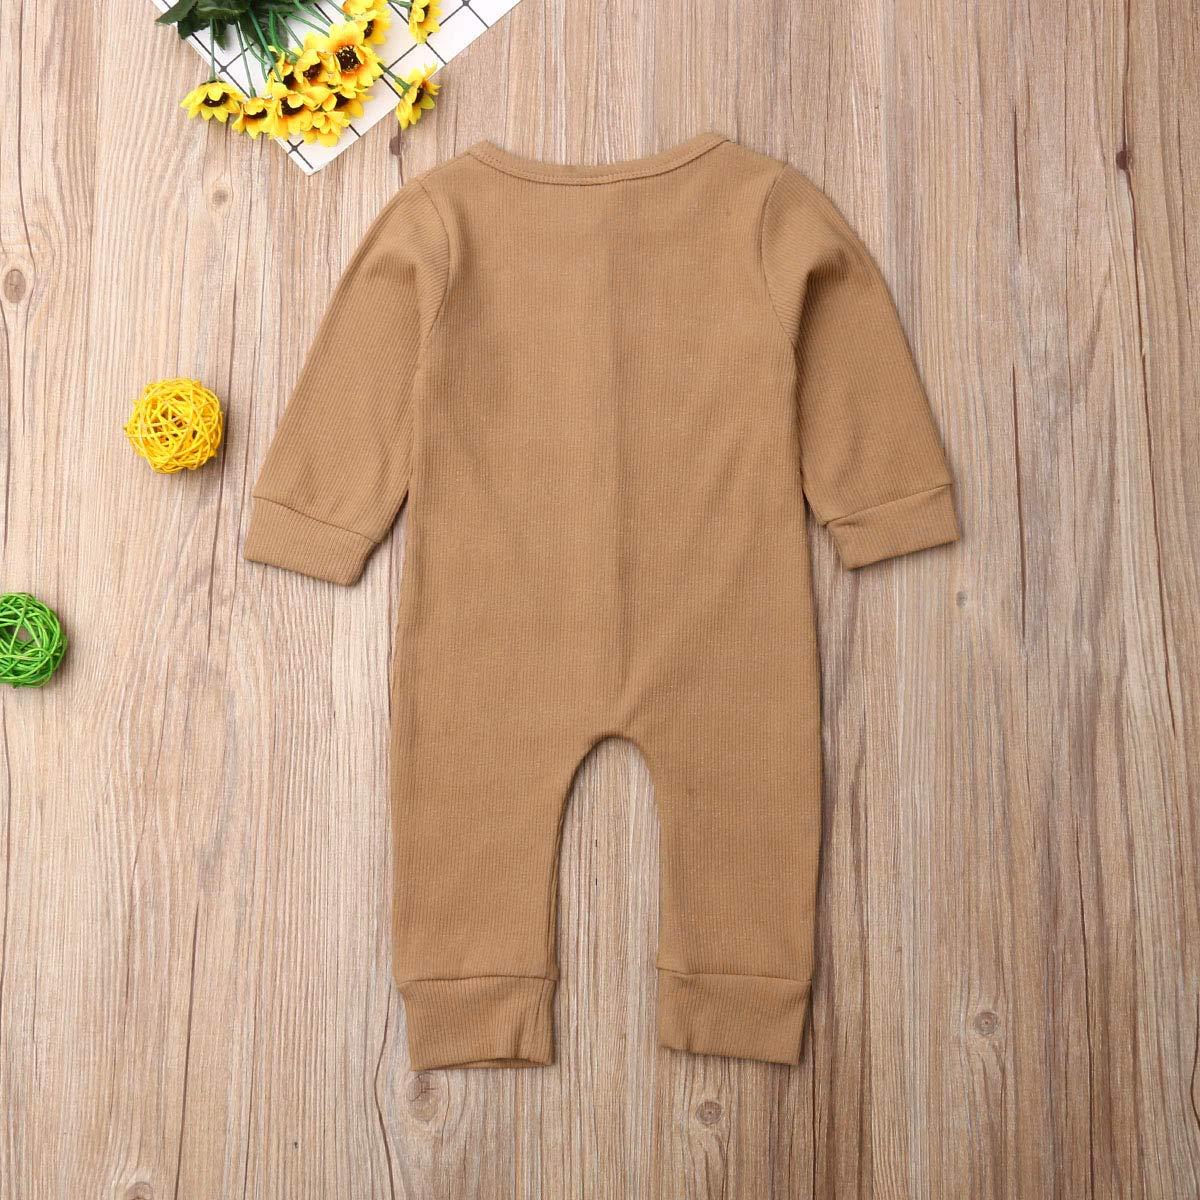 Newborn Kids Baby Bodysuit Set Girl Boy Cute Long Sleeve Buttons Romper Jumpsuit Playsuit Cotton Outfit Clothes 0-24 Months